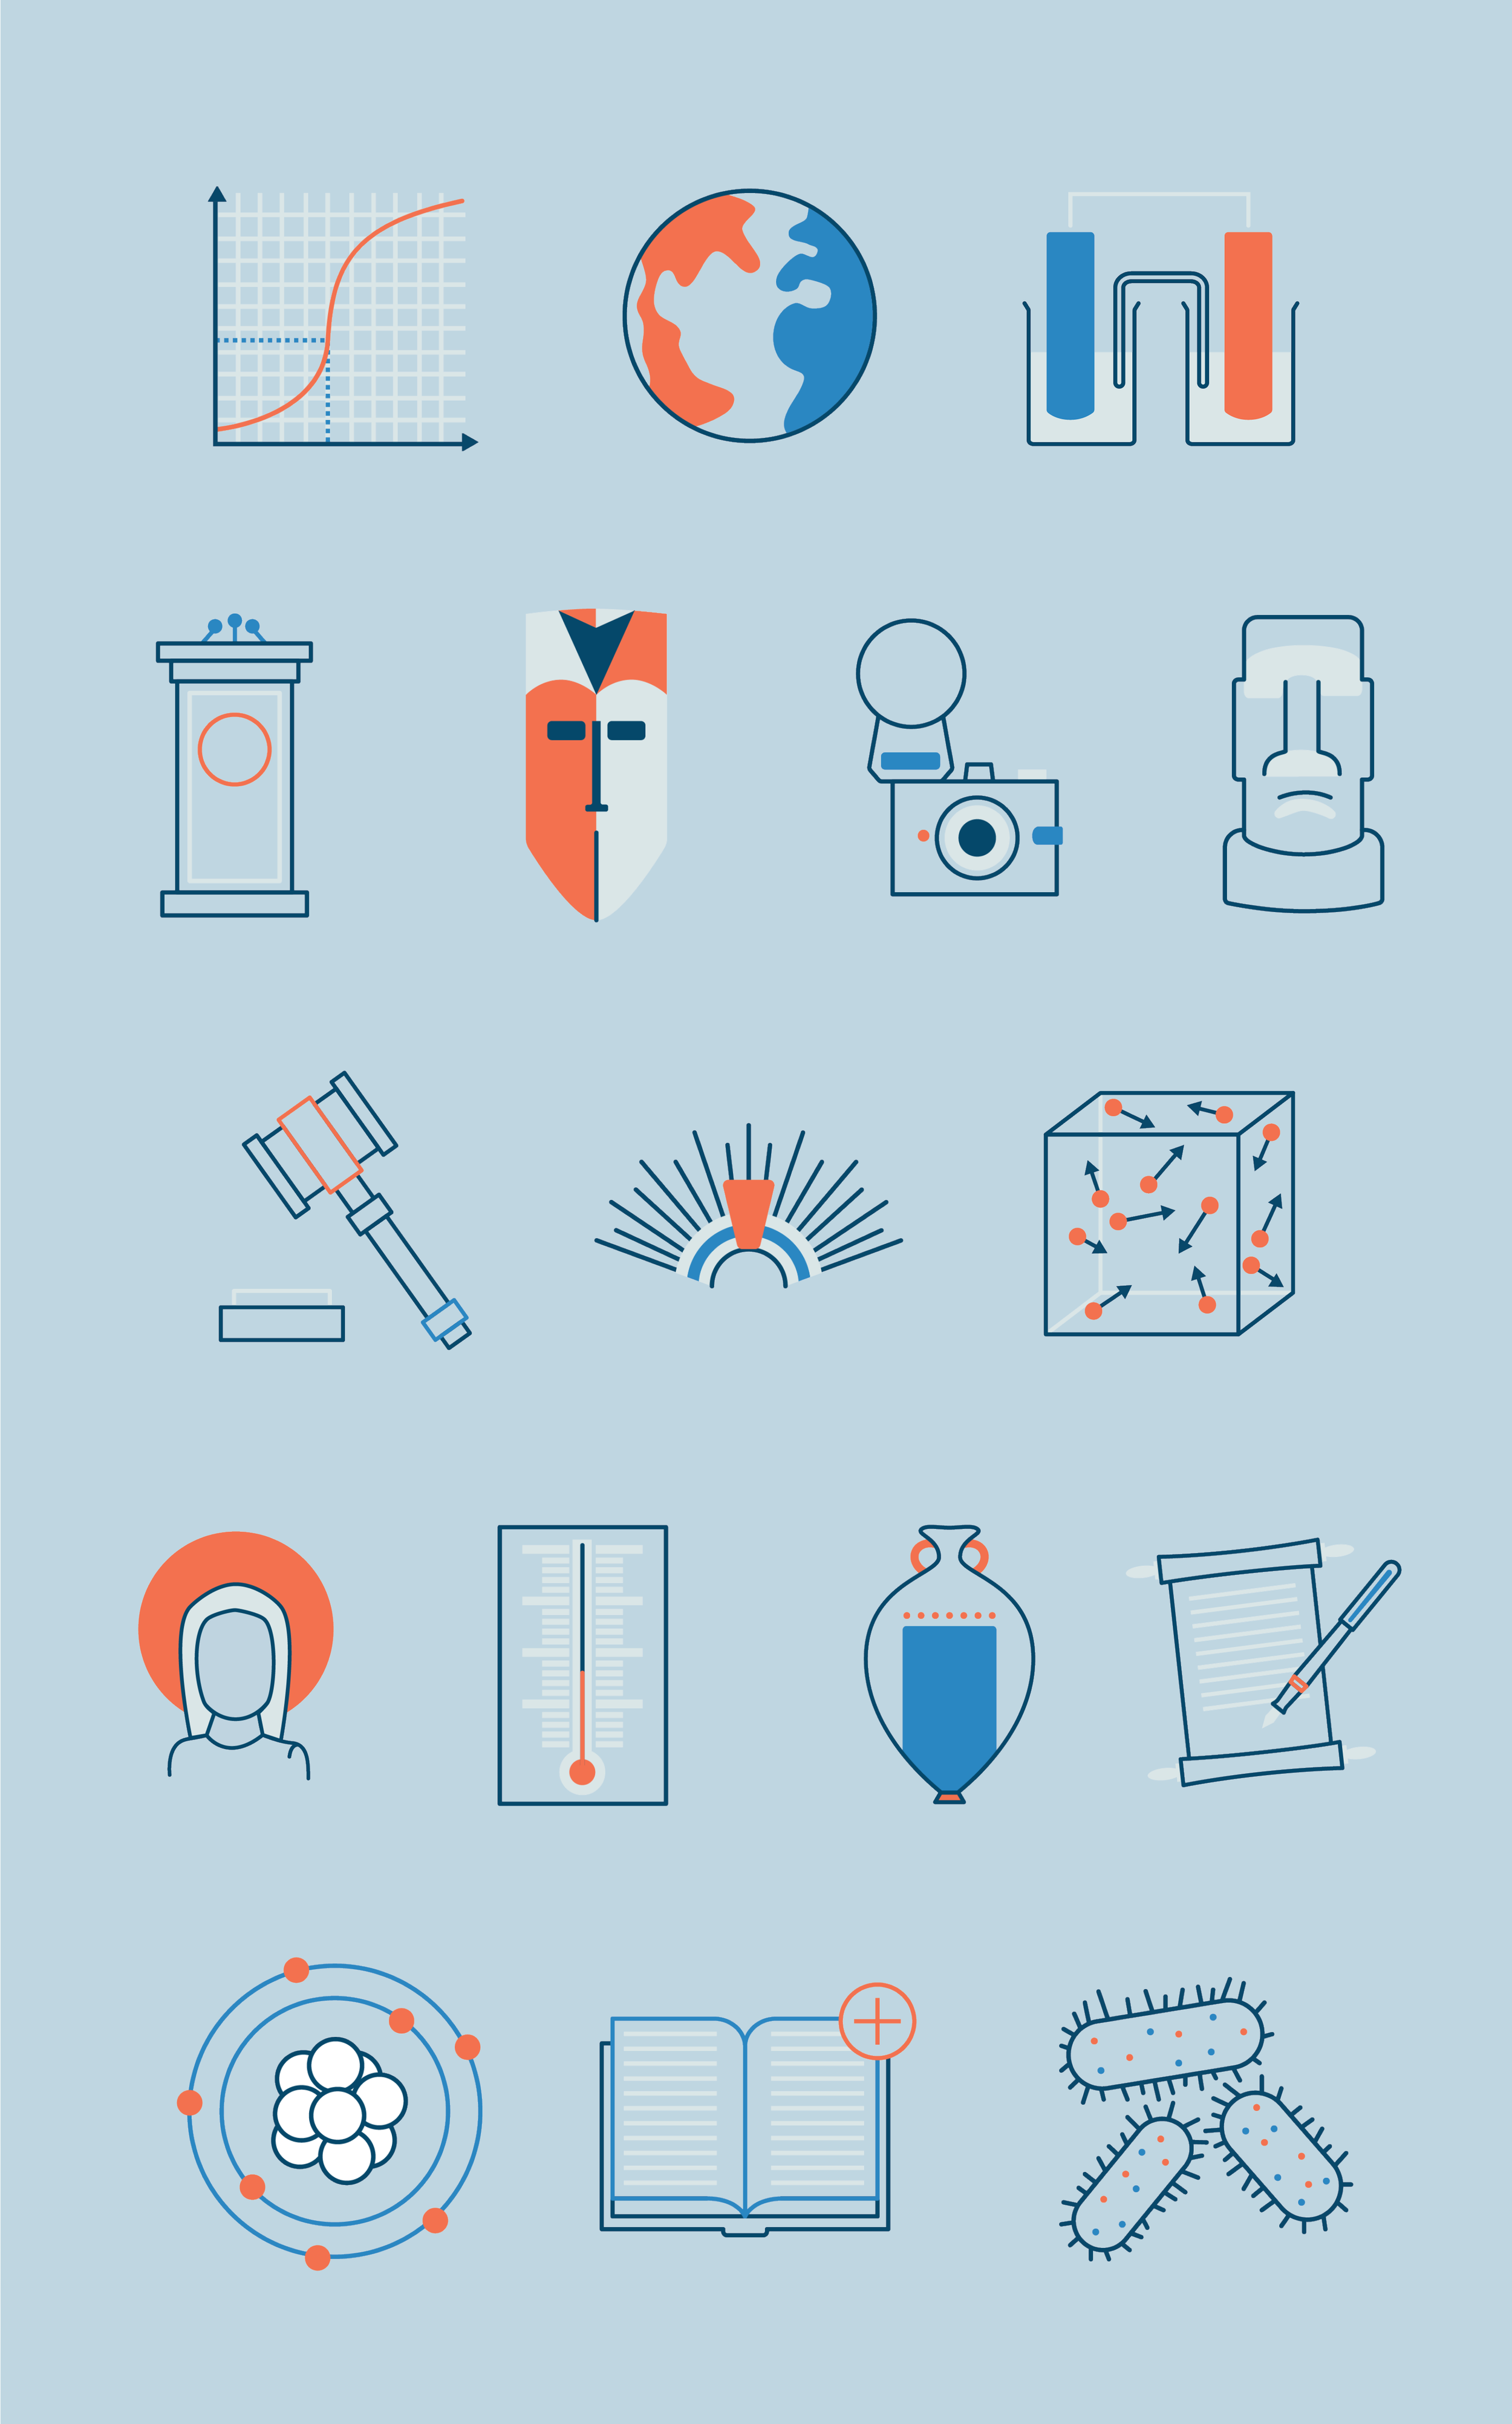 icons-illustration-elenapotter.jpg